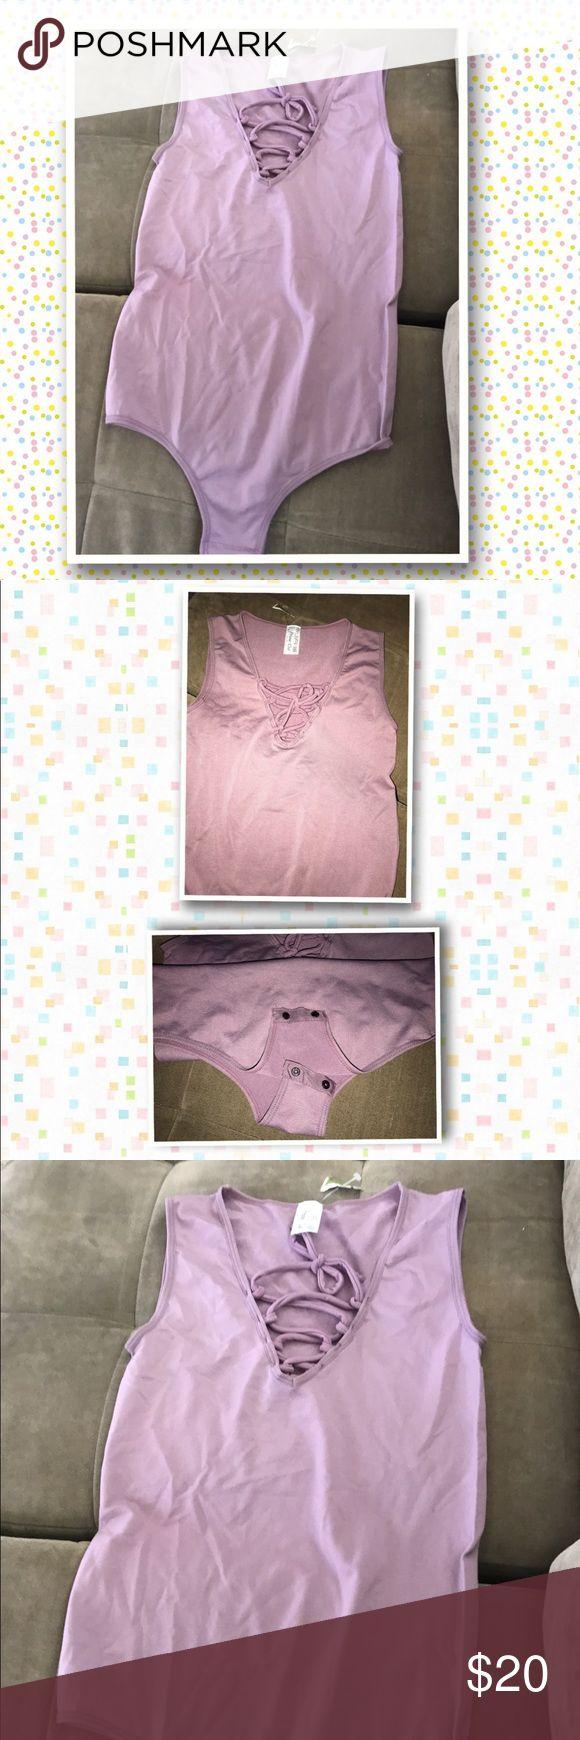 JUMP SUIT •PRIME CUT.  •Size: ONE SIZE.  •Color: Light Purple.       •New.     •Tags Attached. Prime  Cut Other